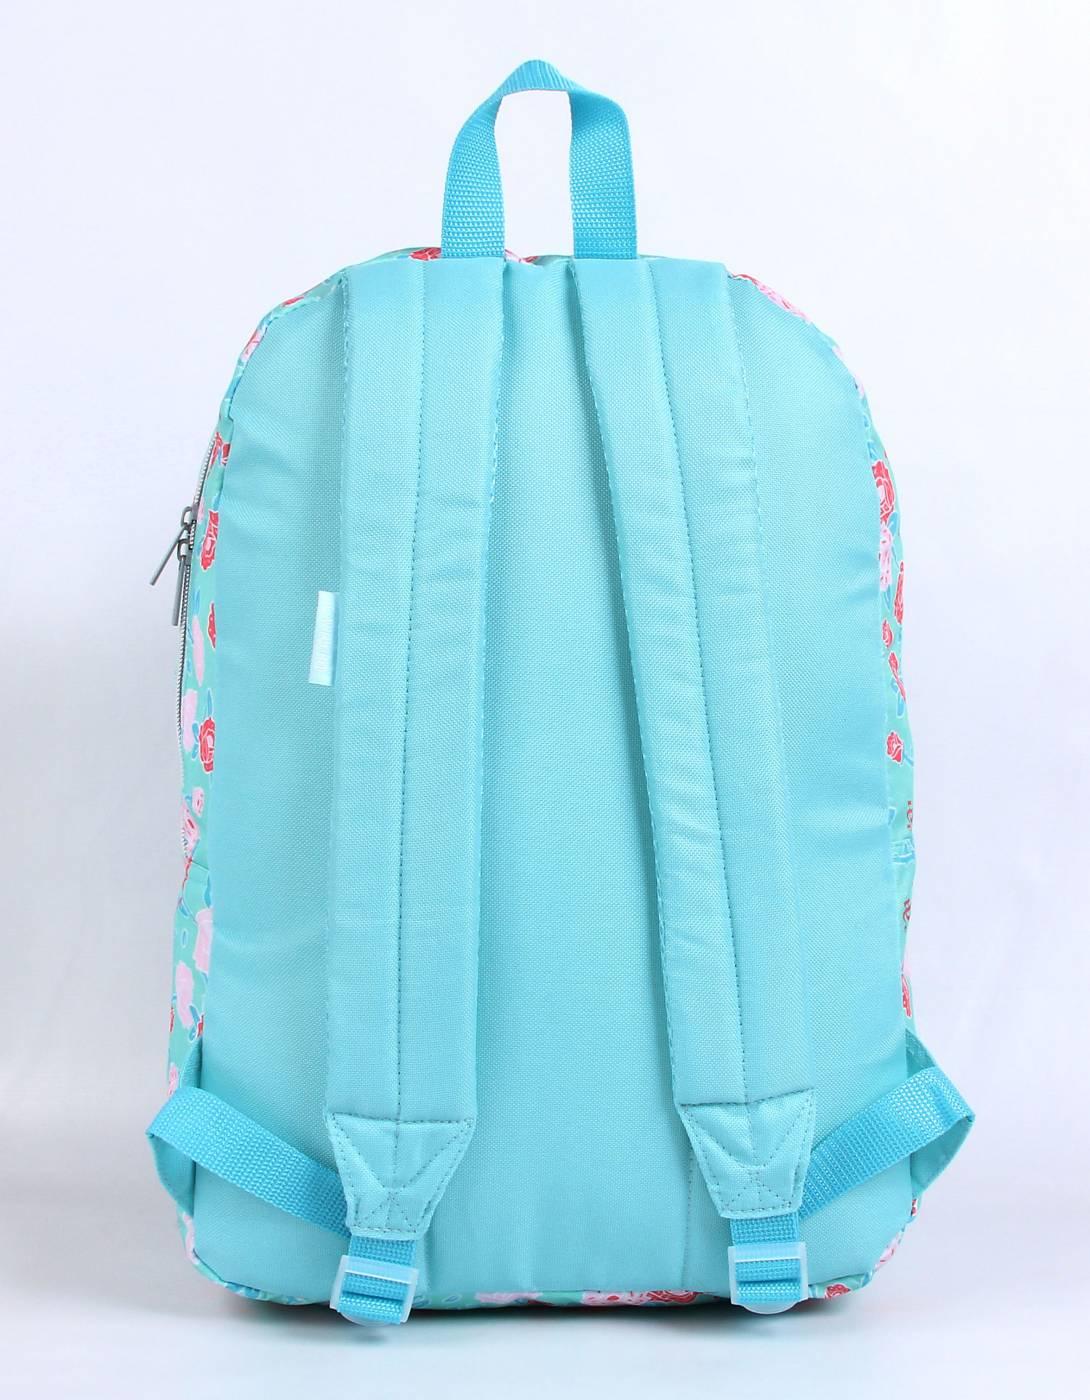 Mochila DMW Capricho Flor 11330 - Azul Claro